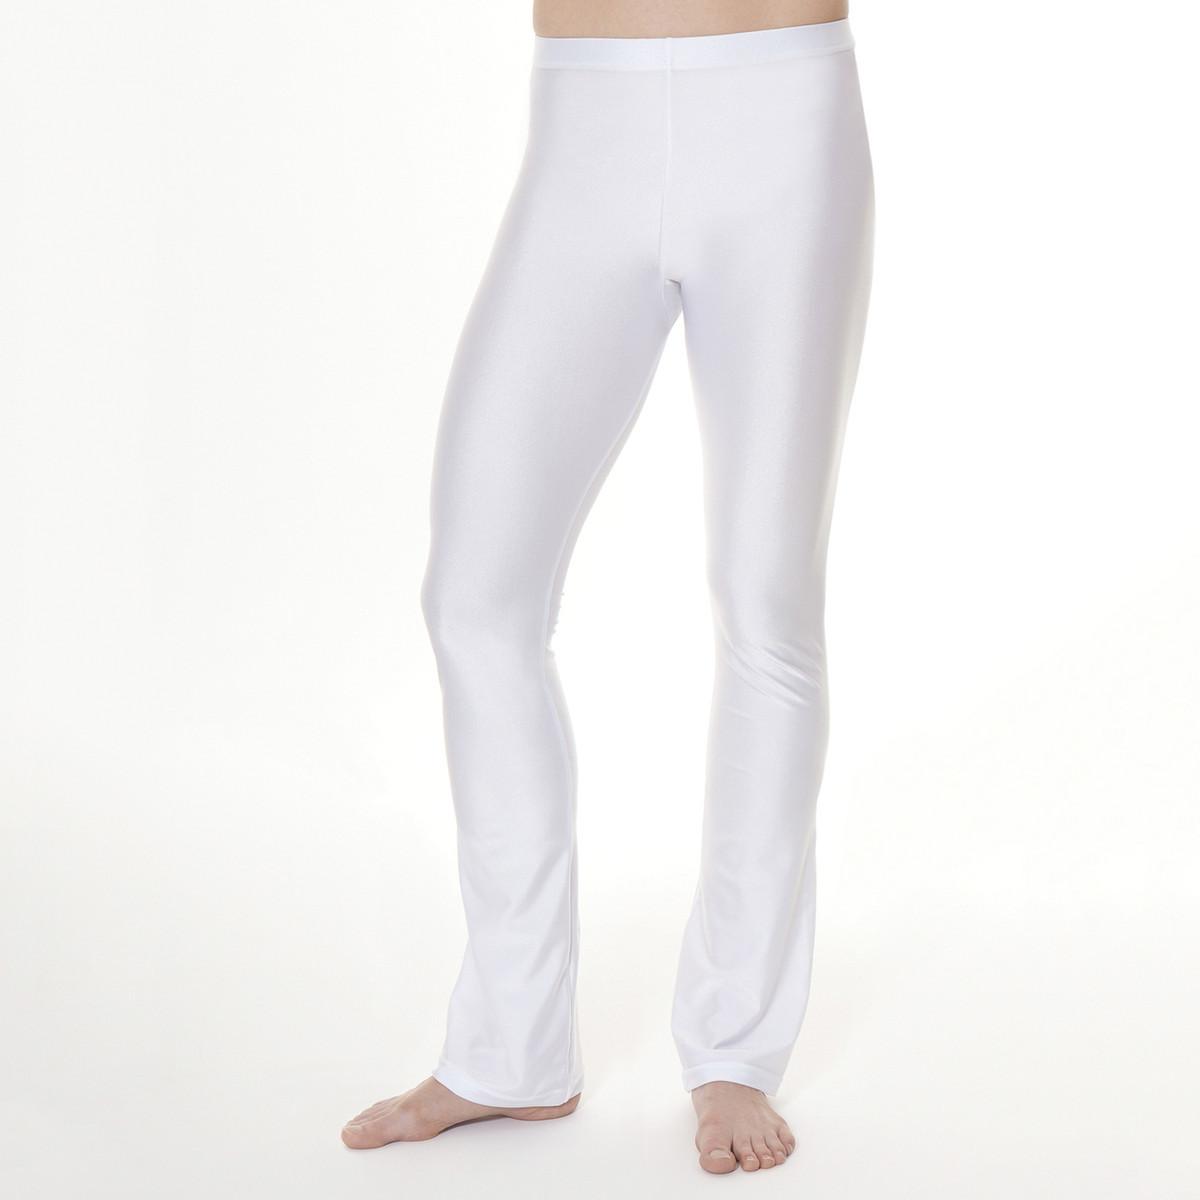 BOOTLEG PANT - WHITE